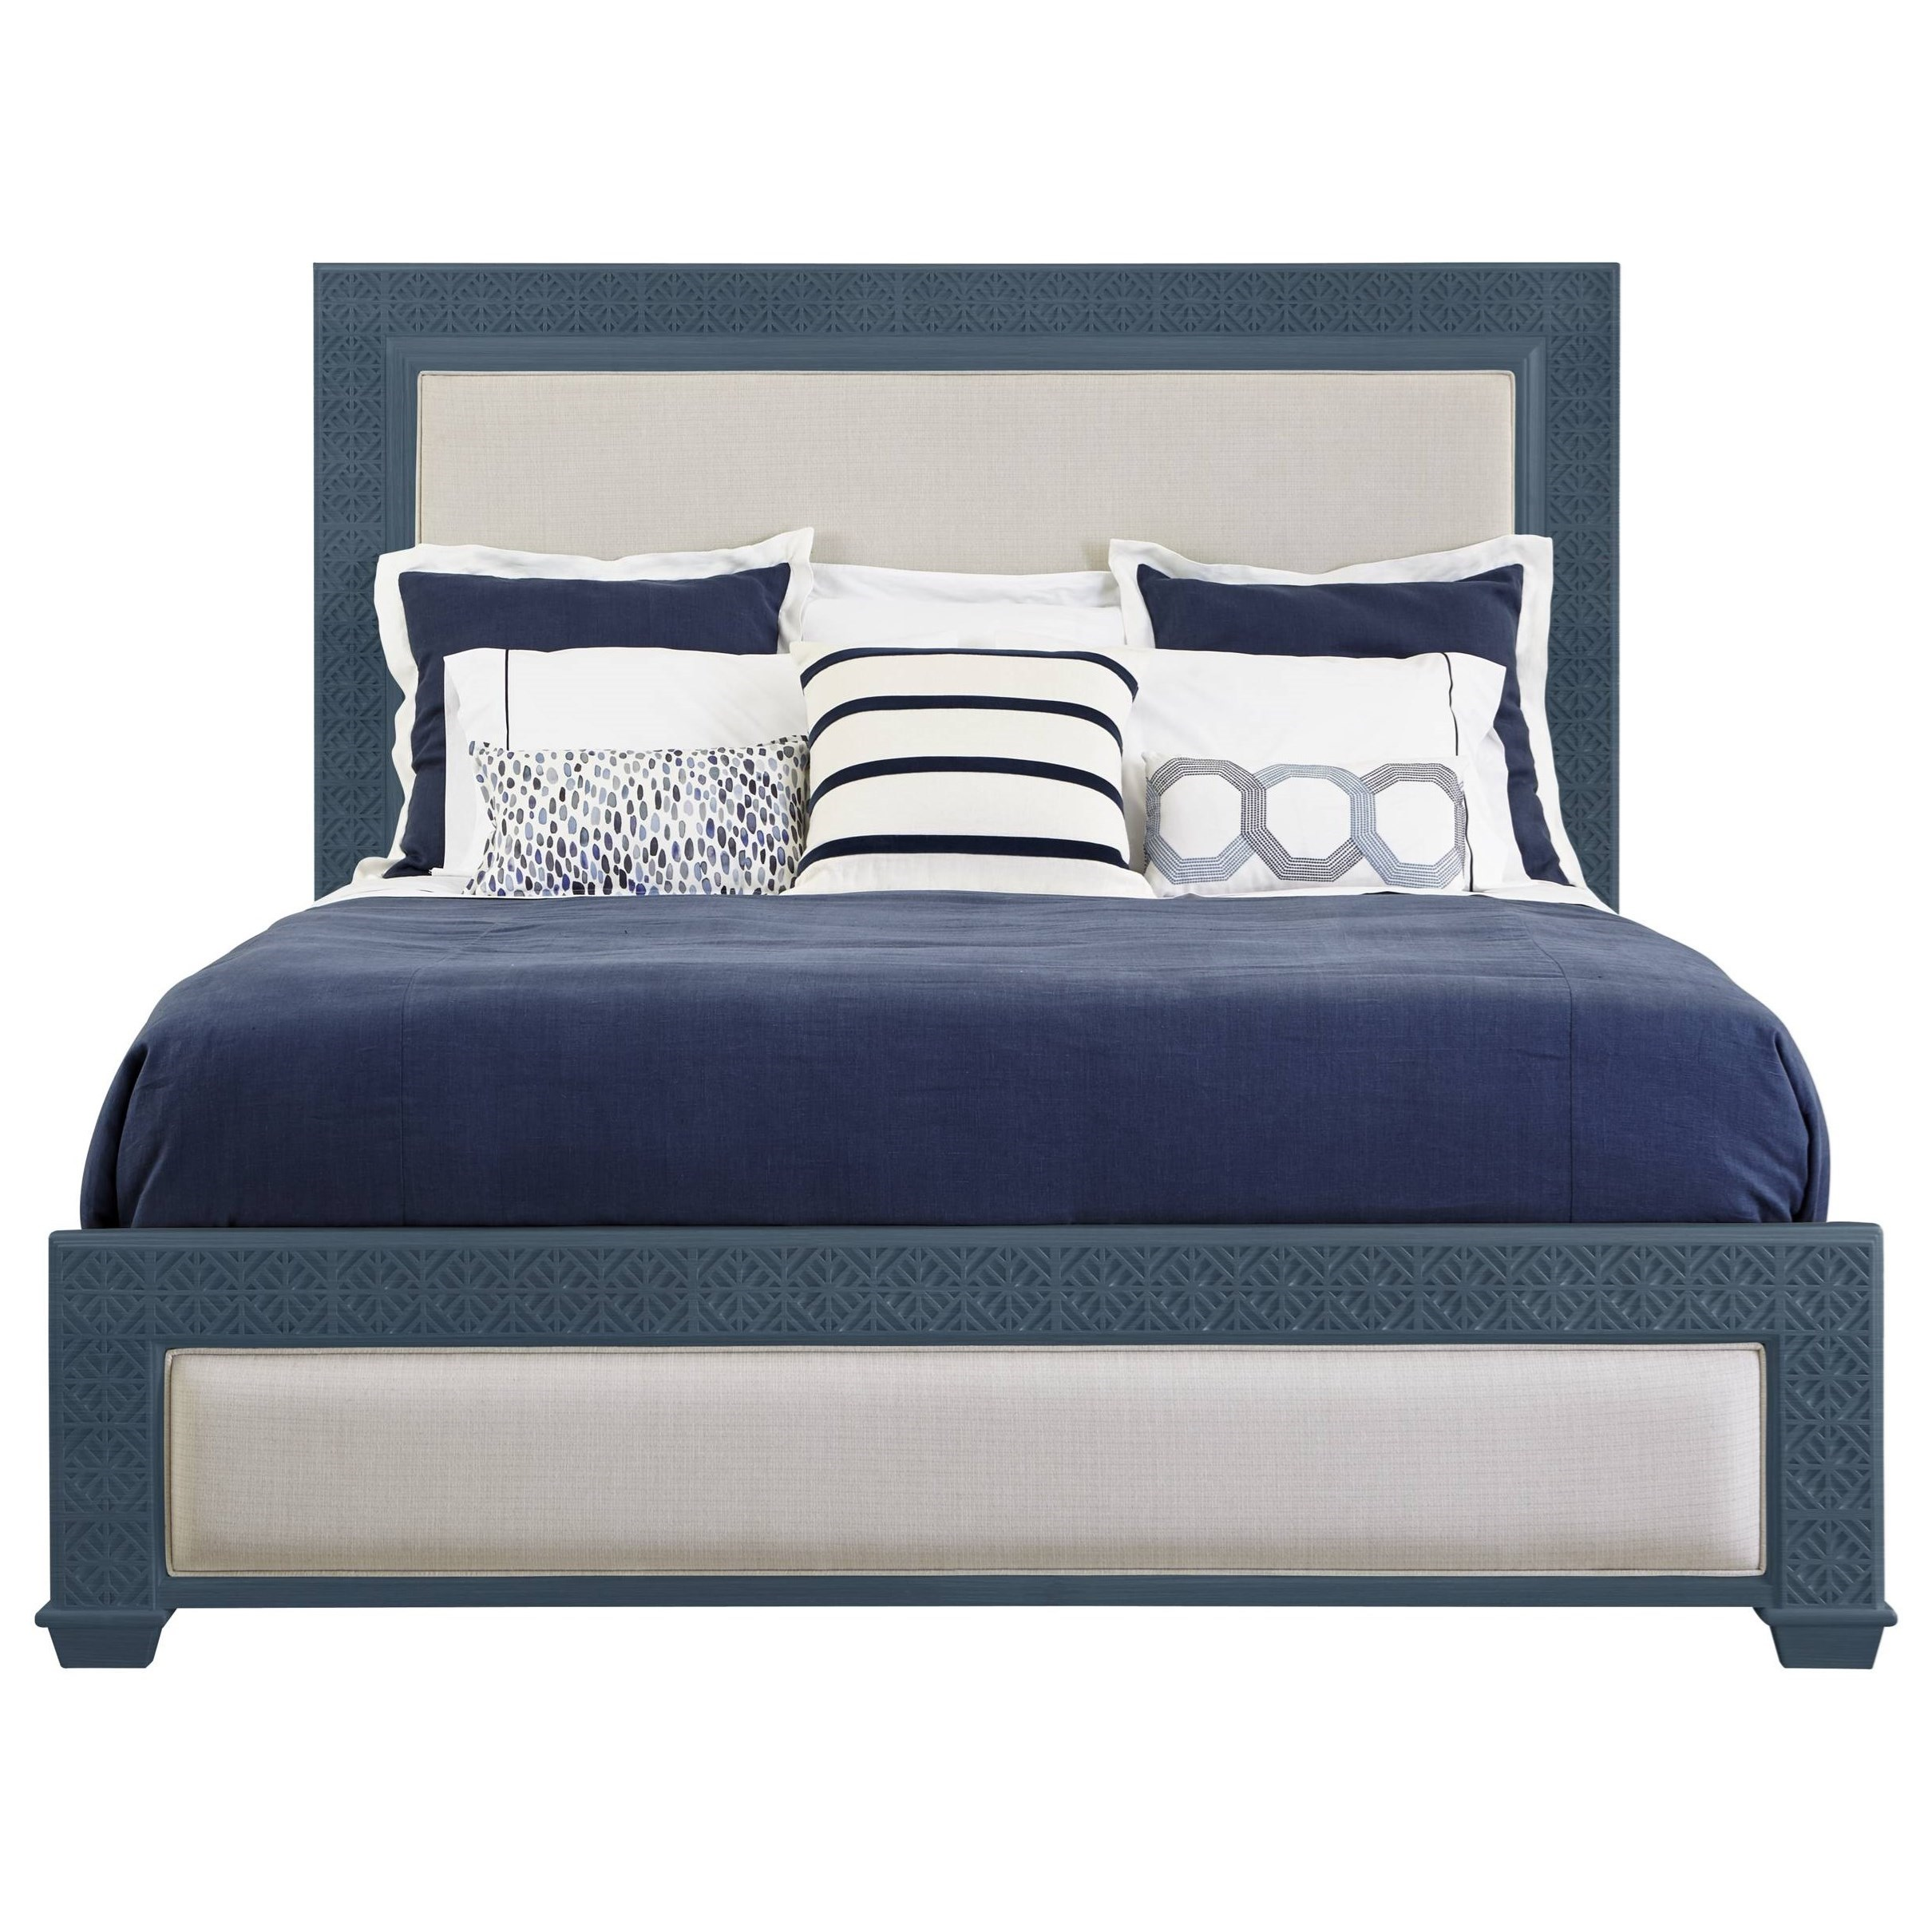 Stanley Furniture Coastal Living Oasis King Catalina Panel Bed - Item Number: 527-43-45